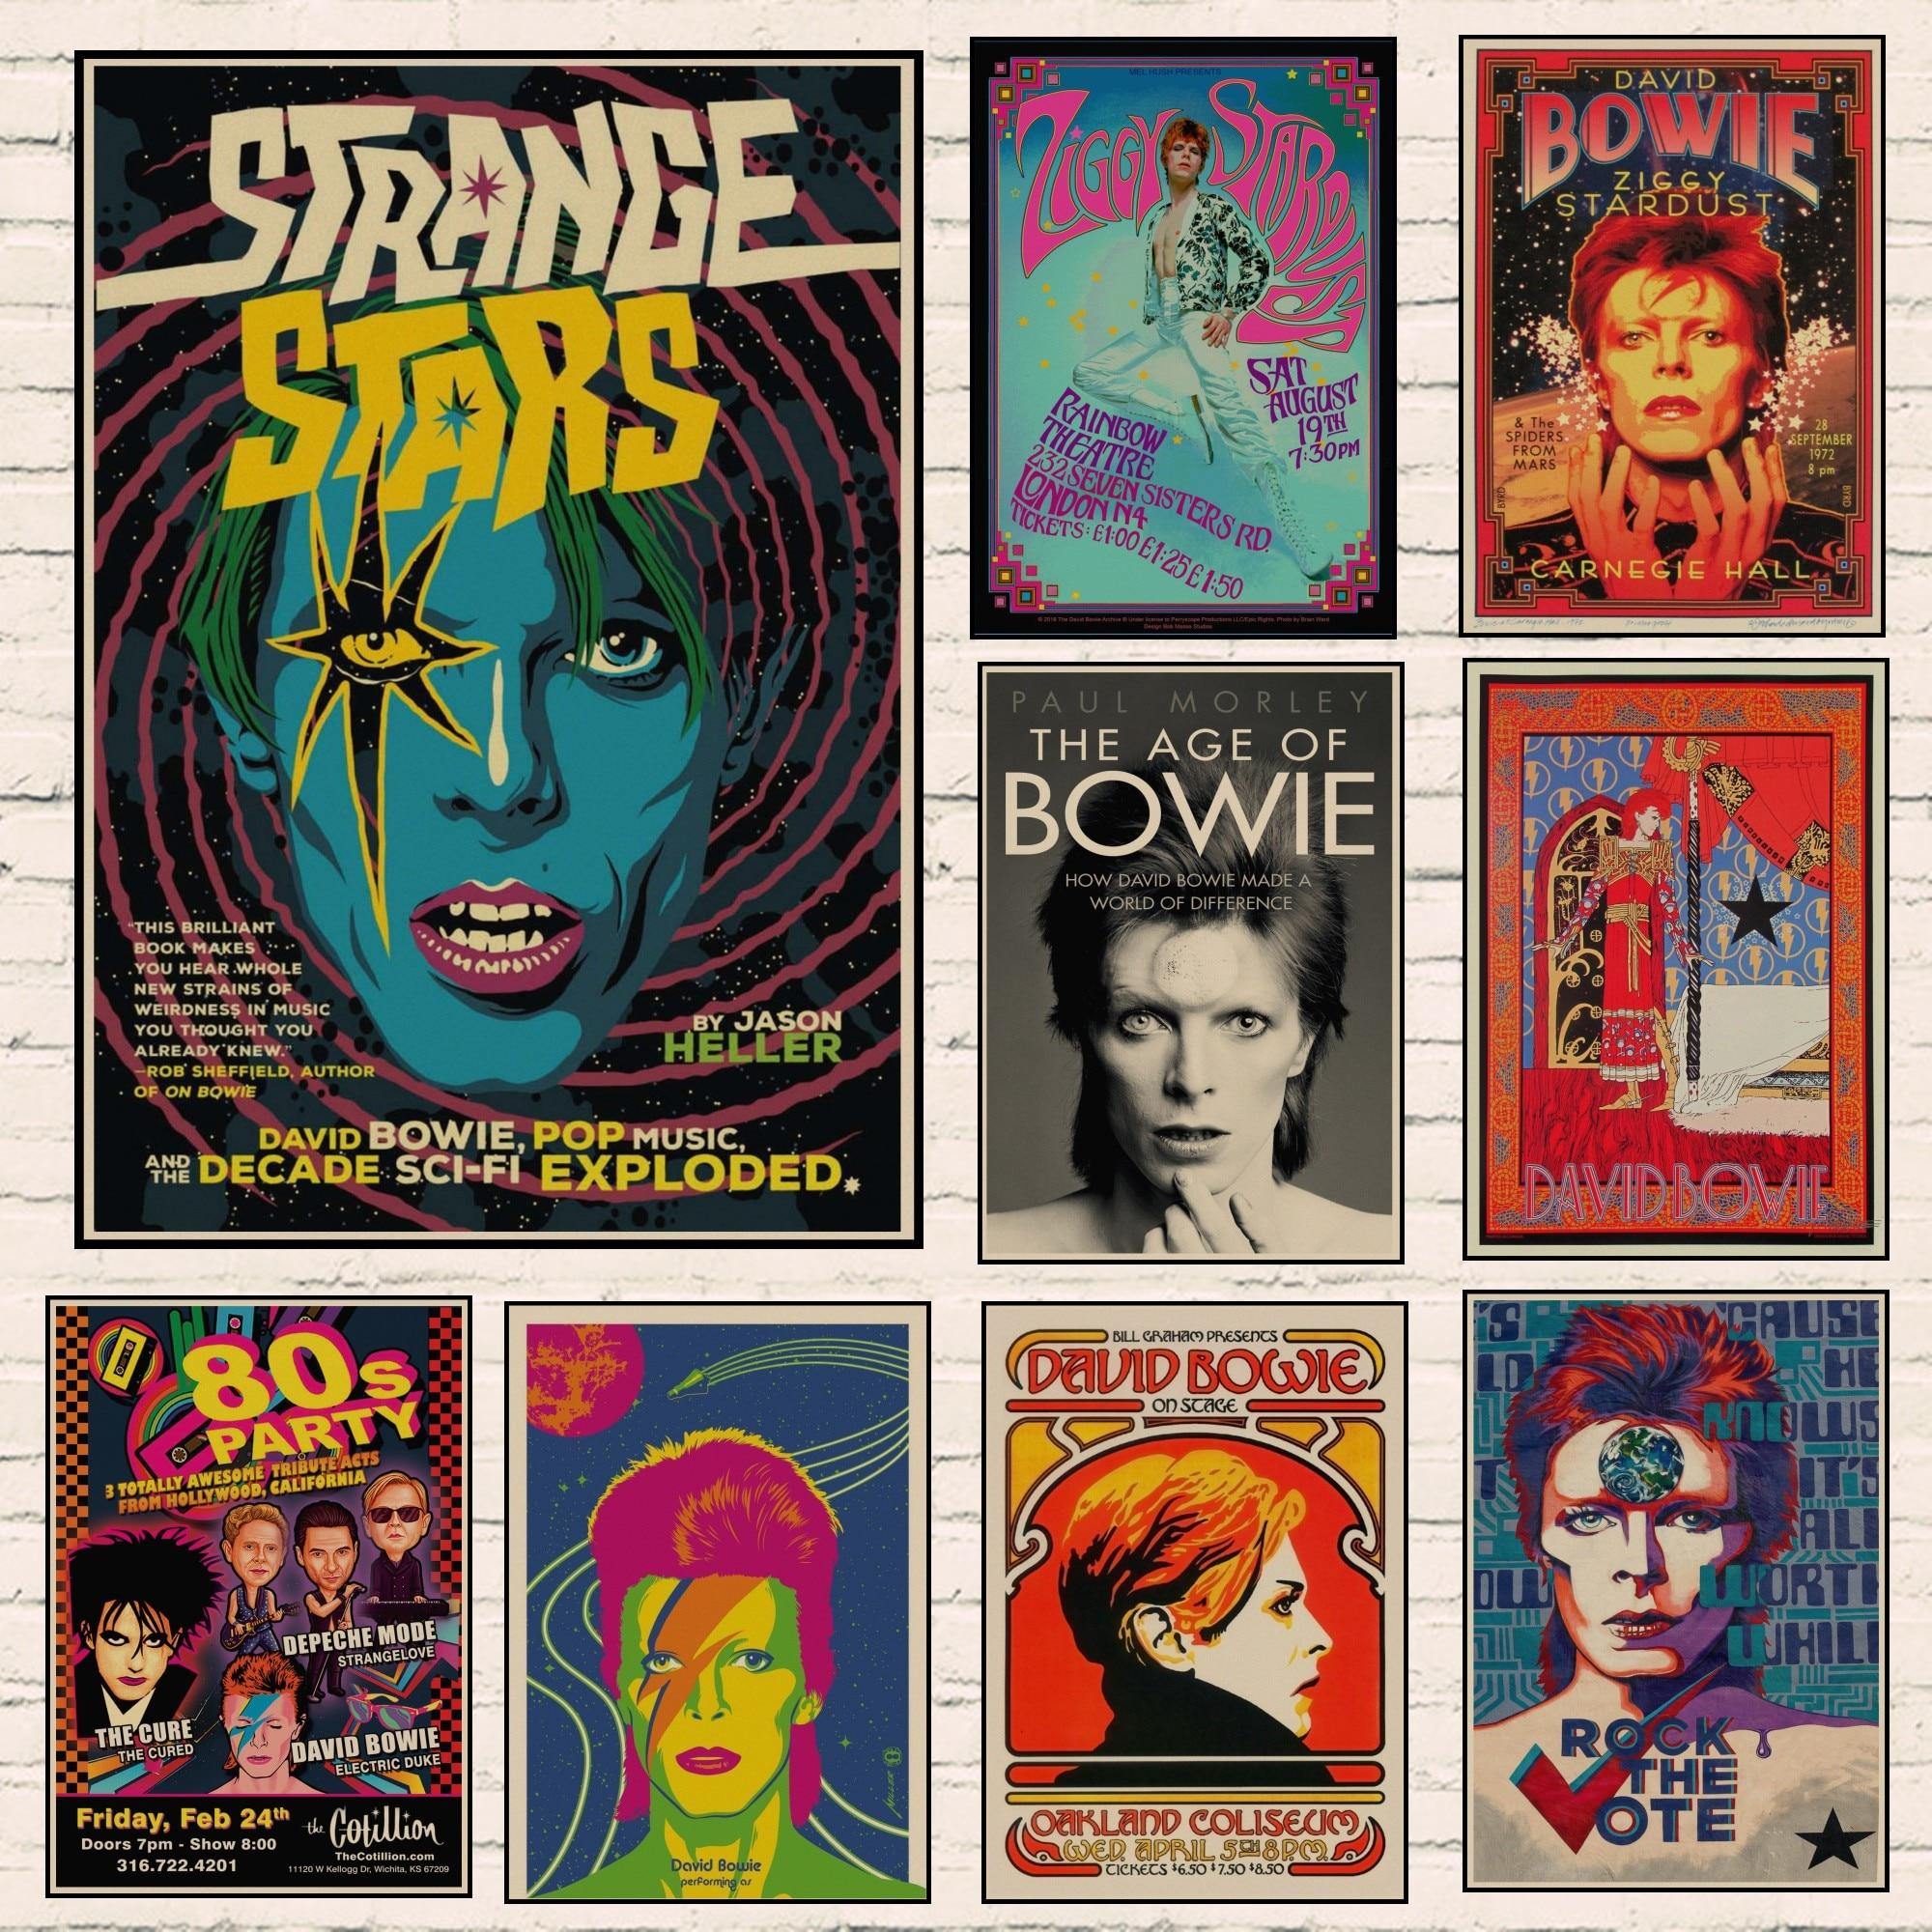 David Bowie постер Ретро винтажная рок-музыка крафт-бумага постеры рок-певица настенные наклейки кафе бар украшение комнаты настенный Декор A3